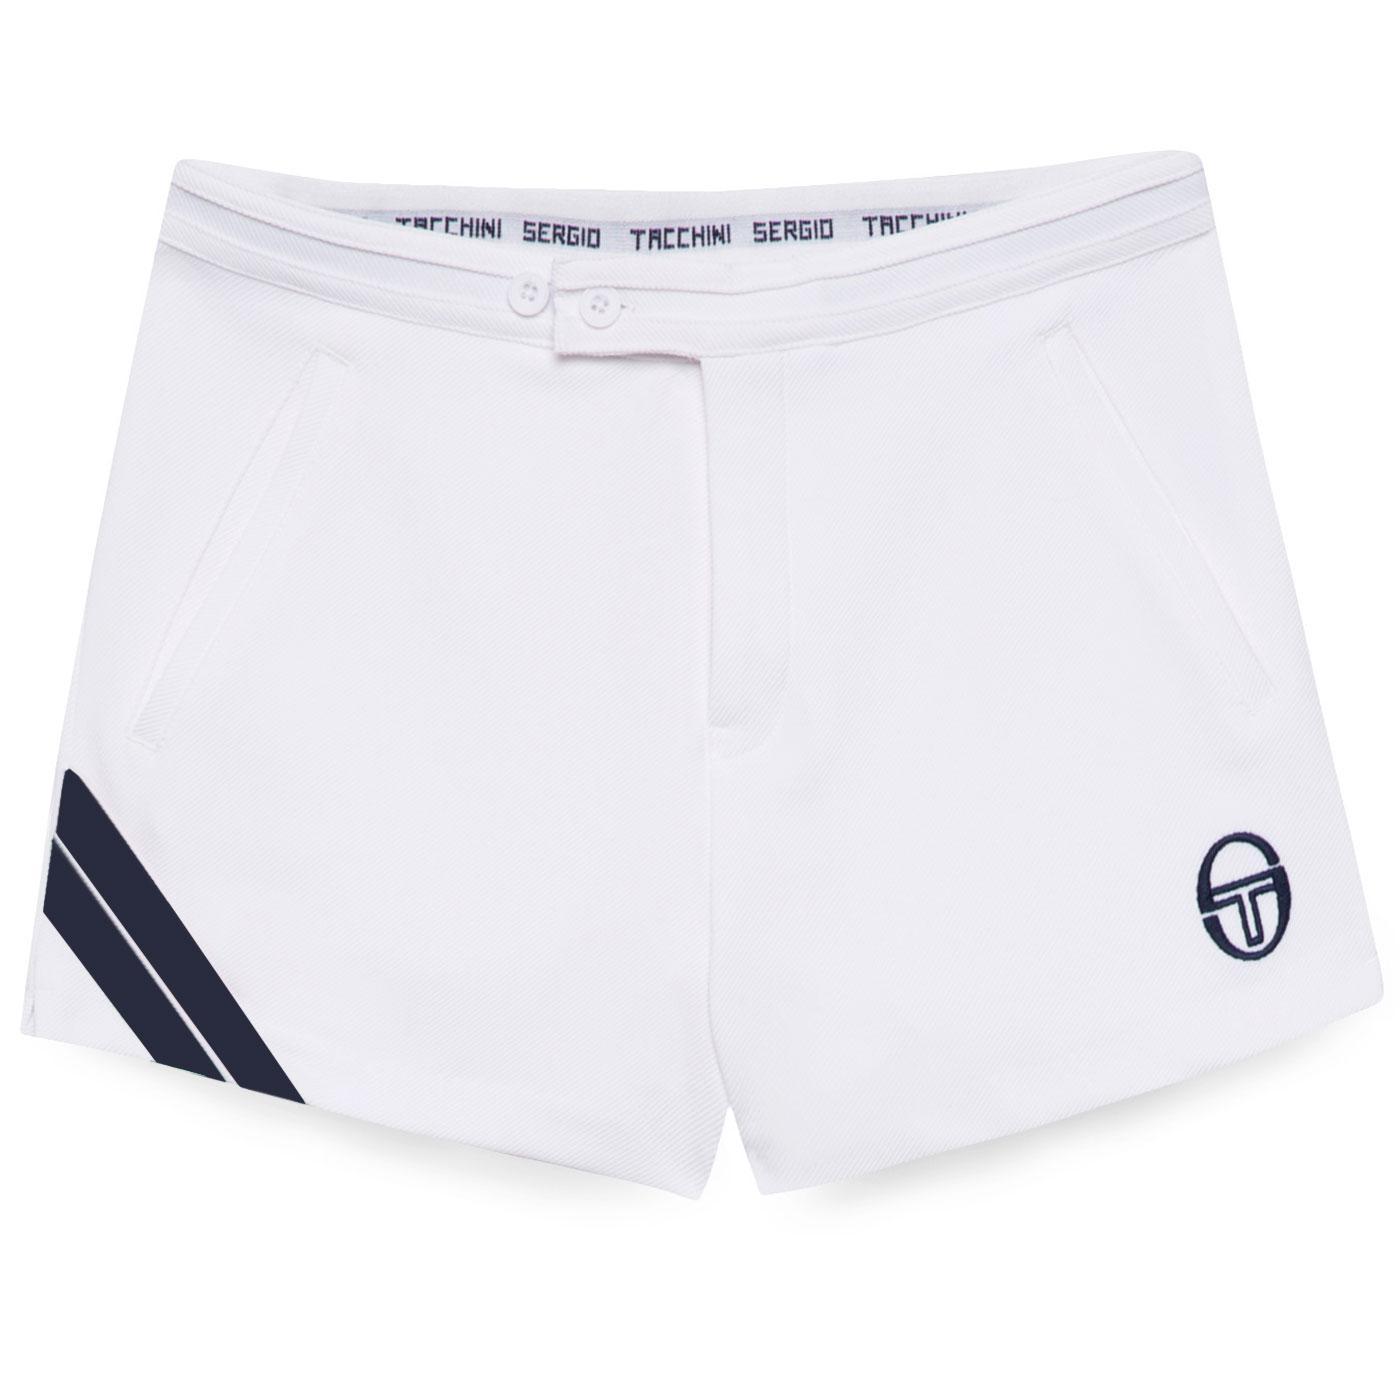 Time SERGIO TACCHINI Retro 70s Tennis Shorts W/N